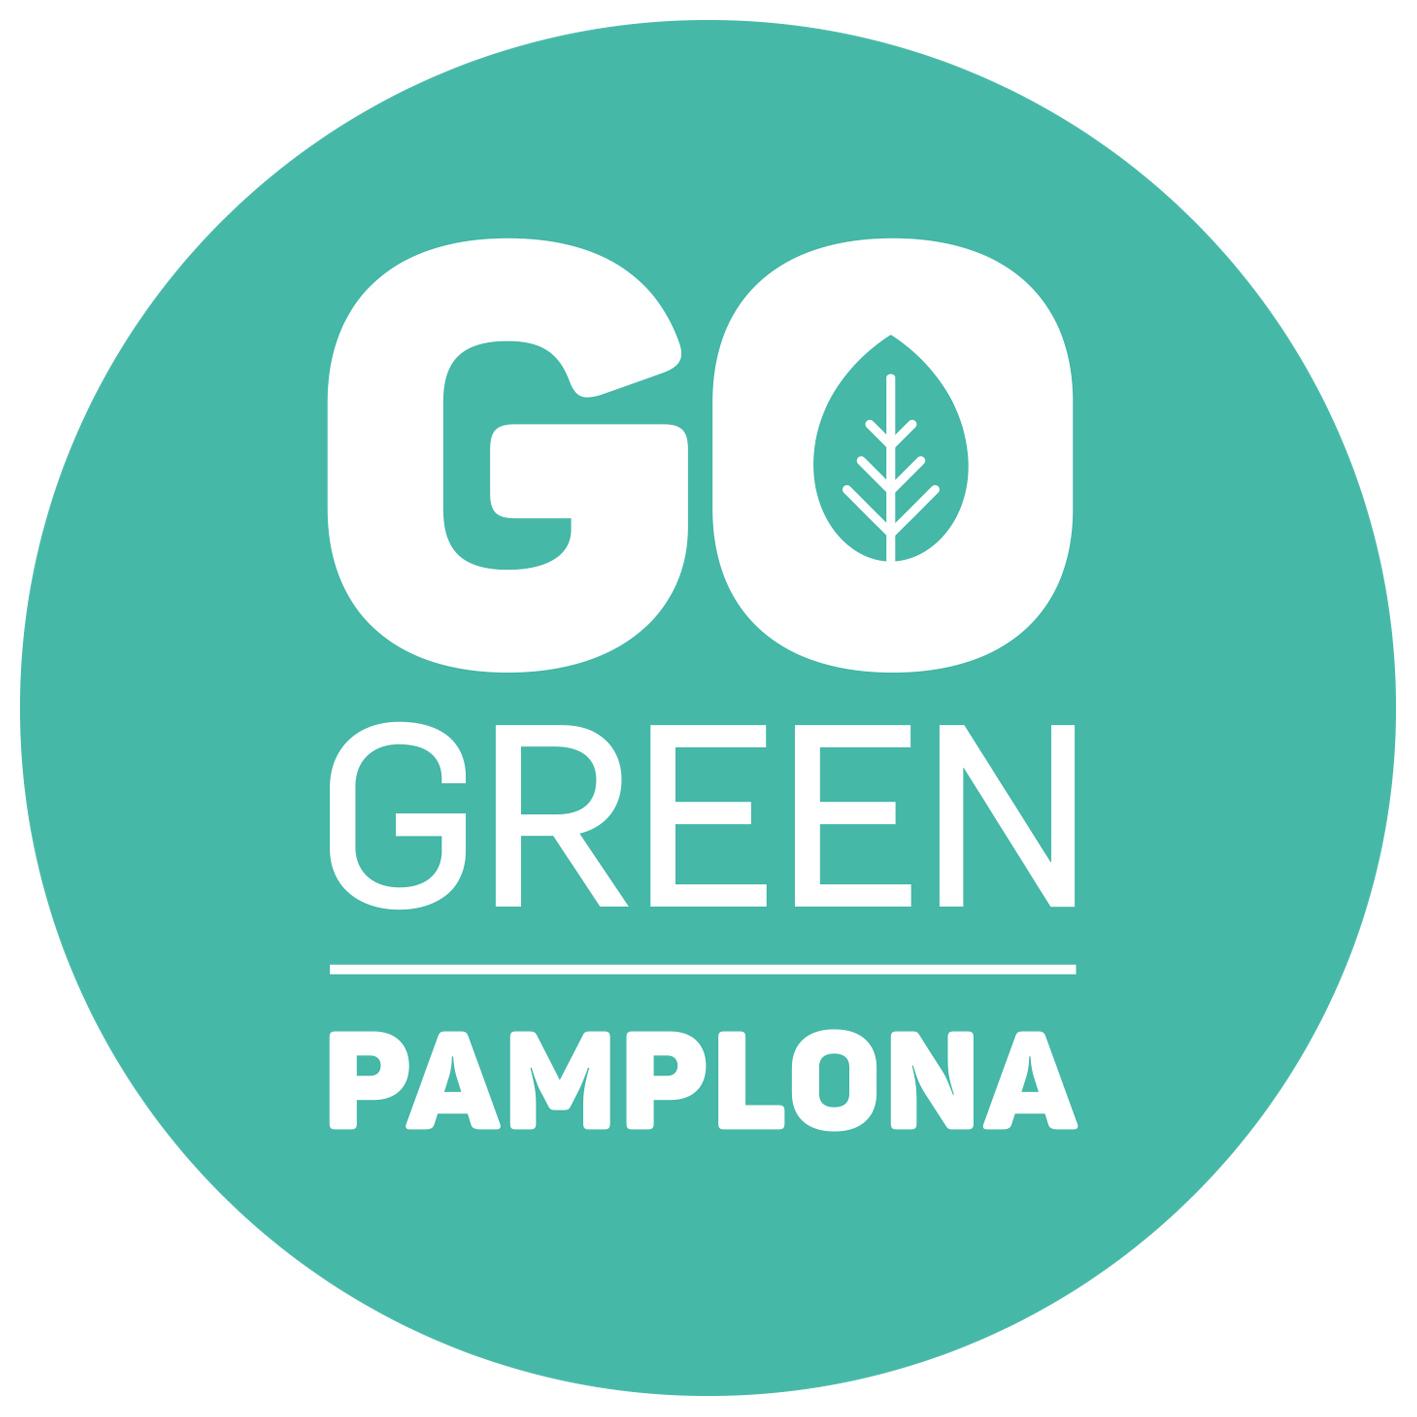 Oui, Go Green Pamplona!